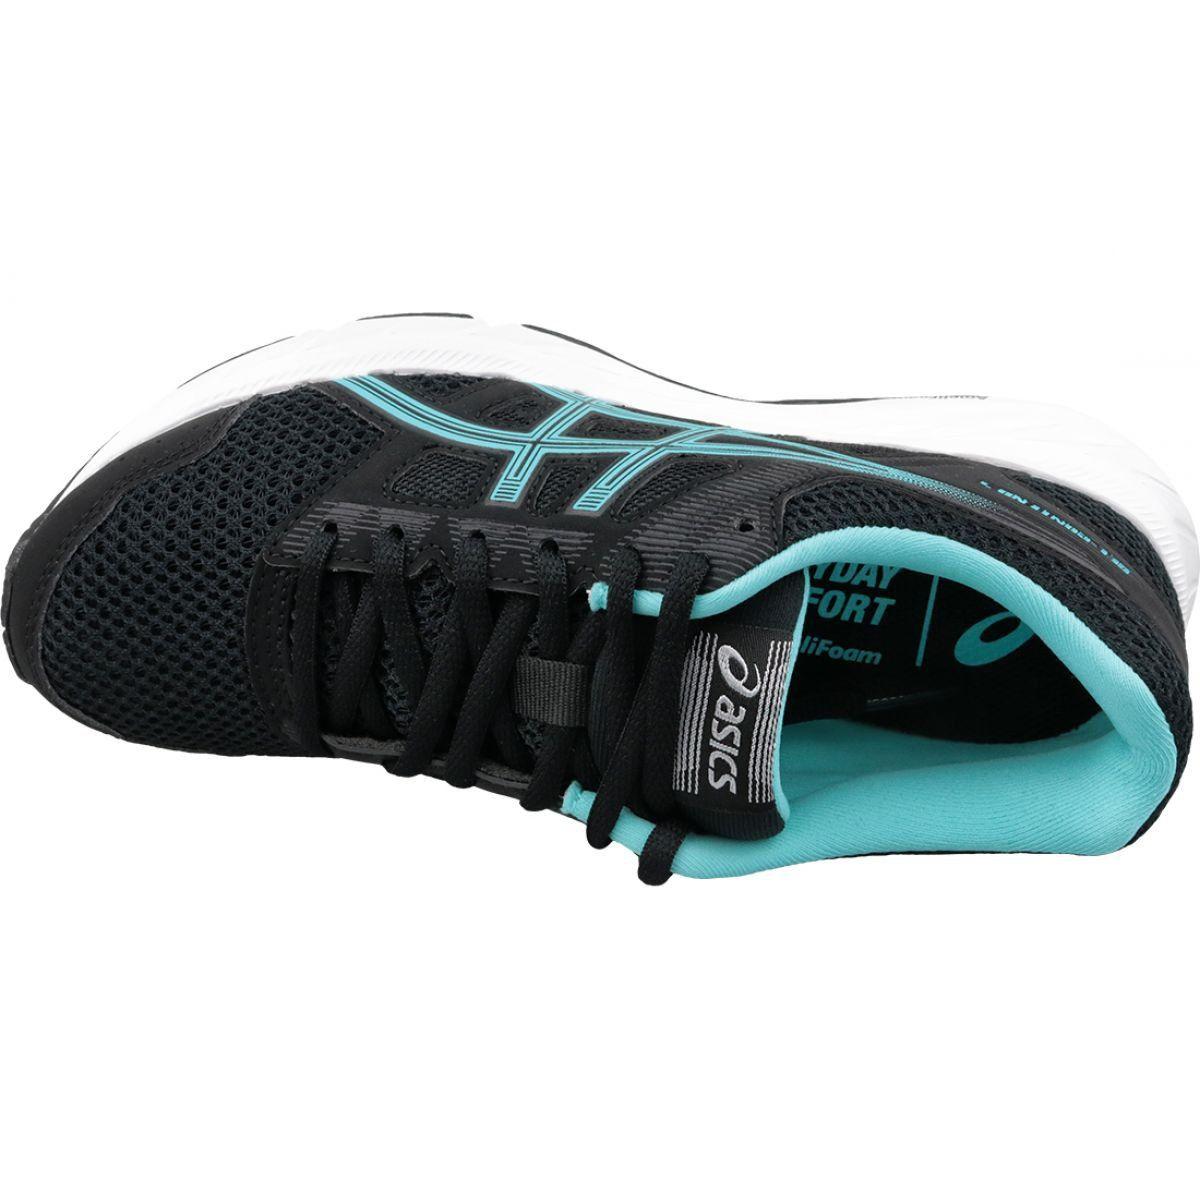 Buty Biegowe Asics Gel Contend 5 W 1012a234 003 Czarne Asics Women Shoes Running Shoes Asics Running Shoes